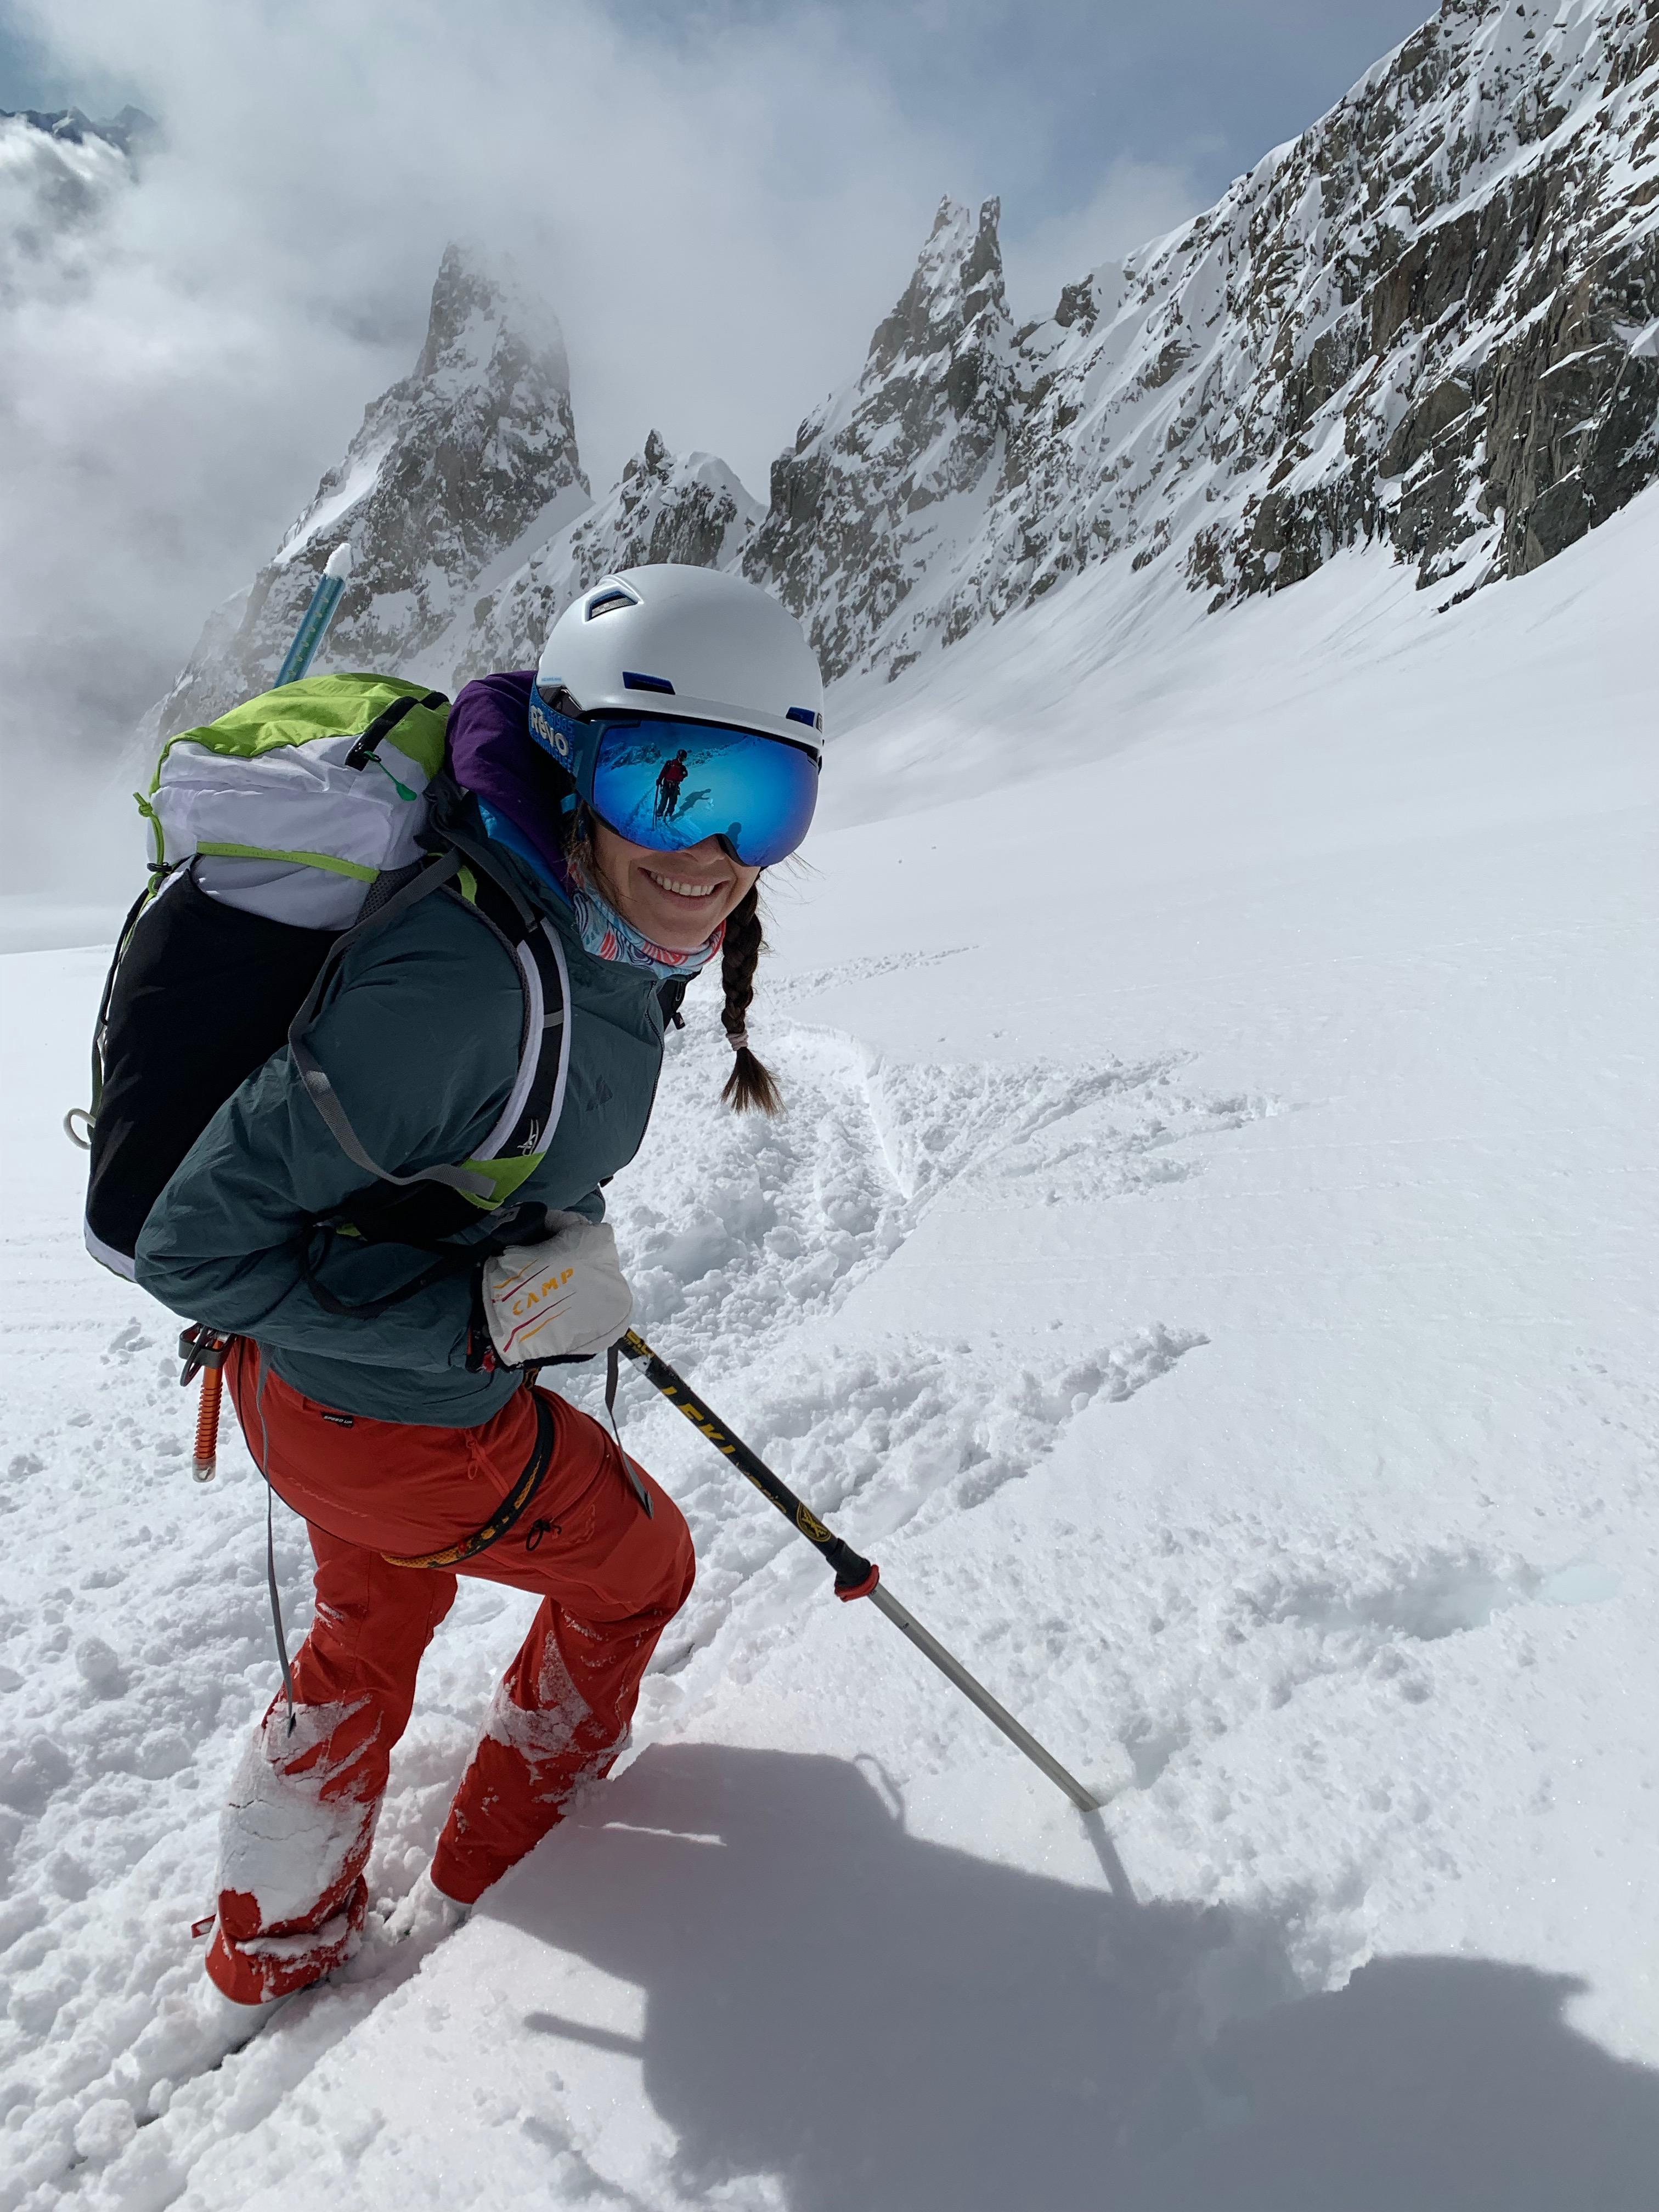 Weinhold skiing in Chamonix, France. Photo] Steve Denny